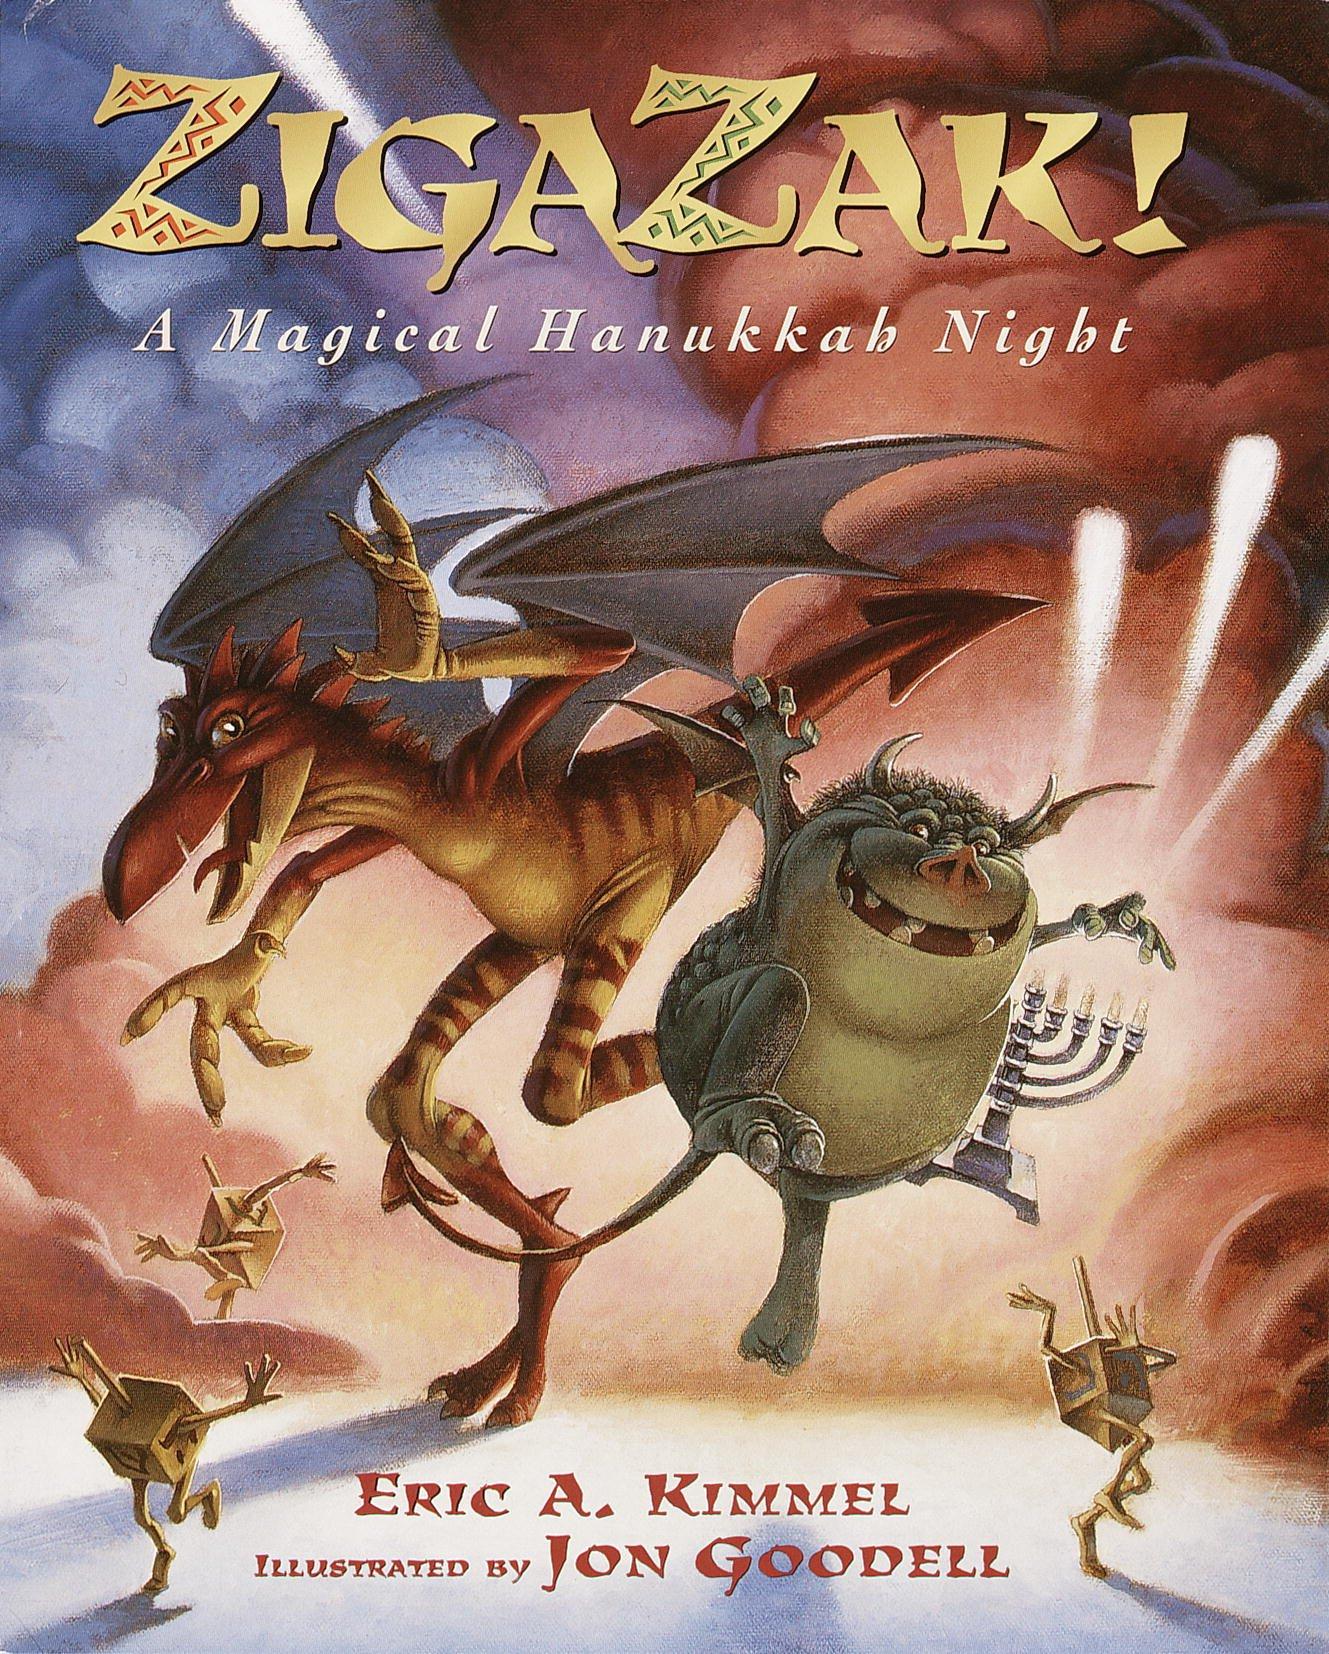 Download Zigazak!: A Magical Hanukkah Night PDF